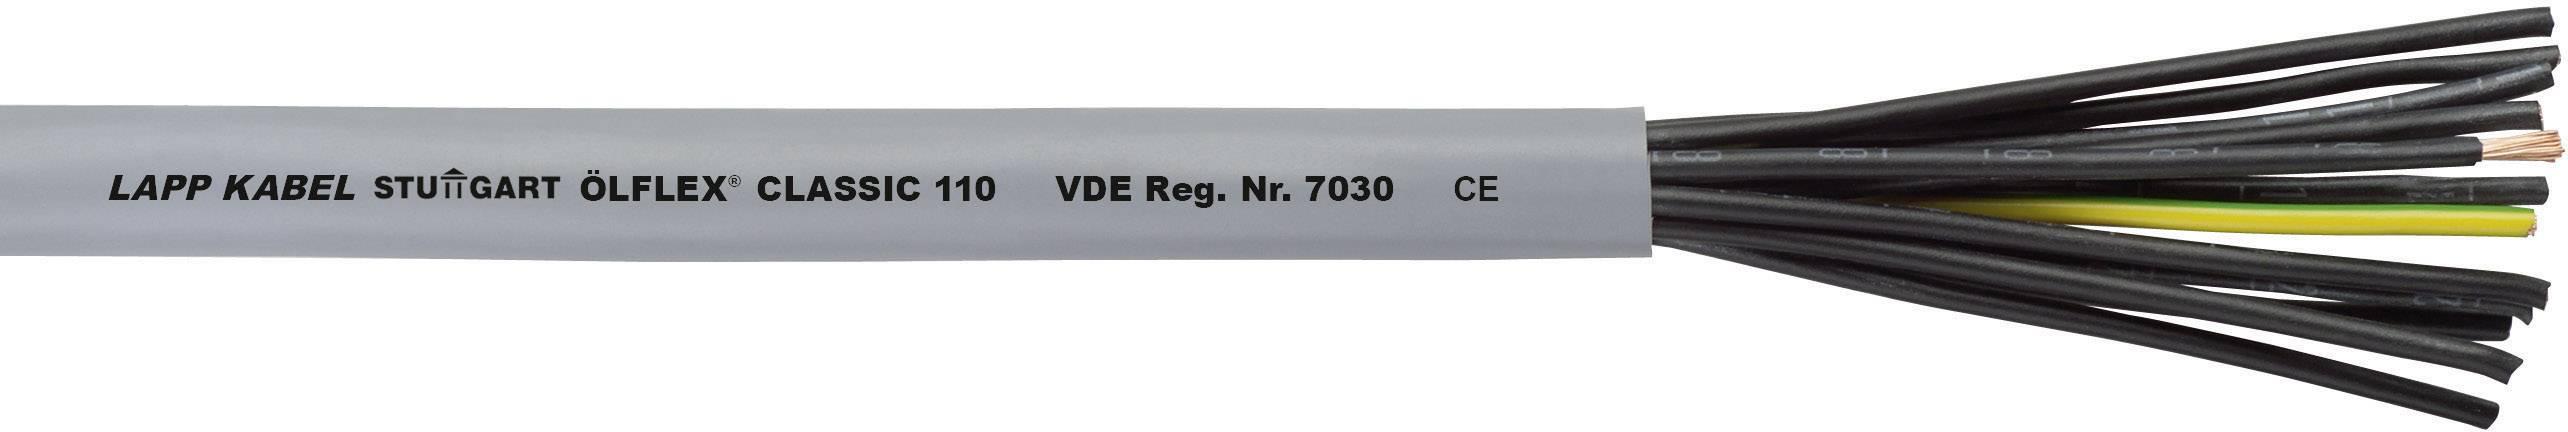 Datový kabel LappKabel Ölflex CLASSIC 110, 4 x 1 mm², šedá, 1 m